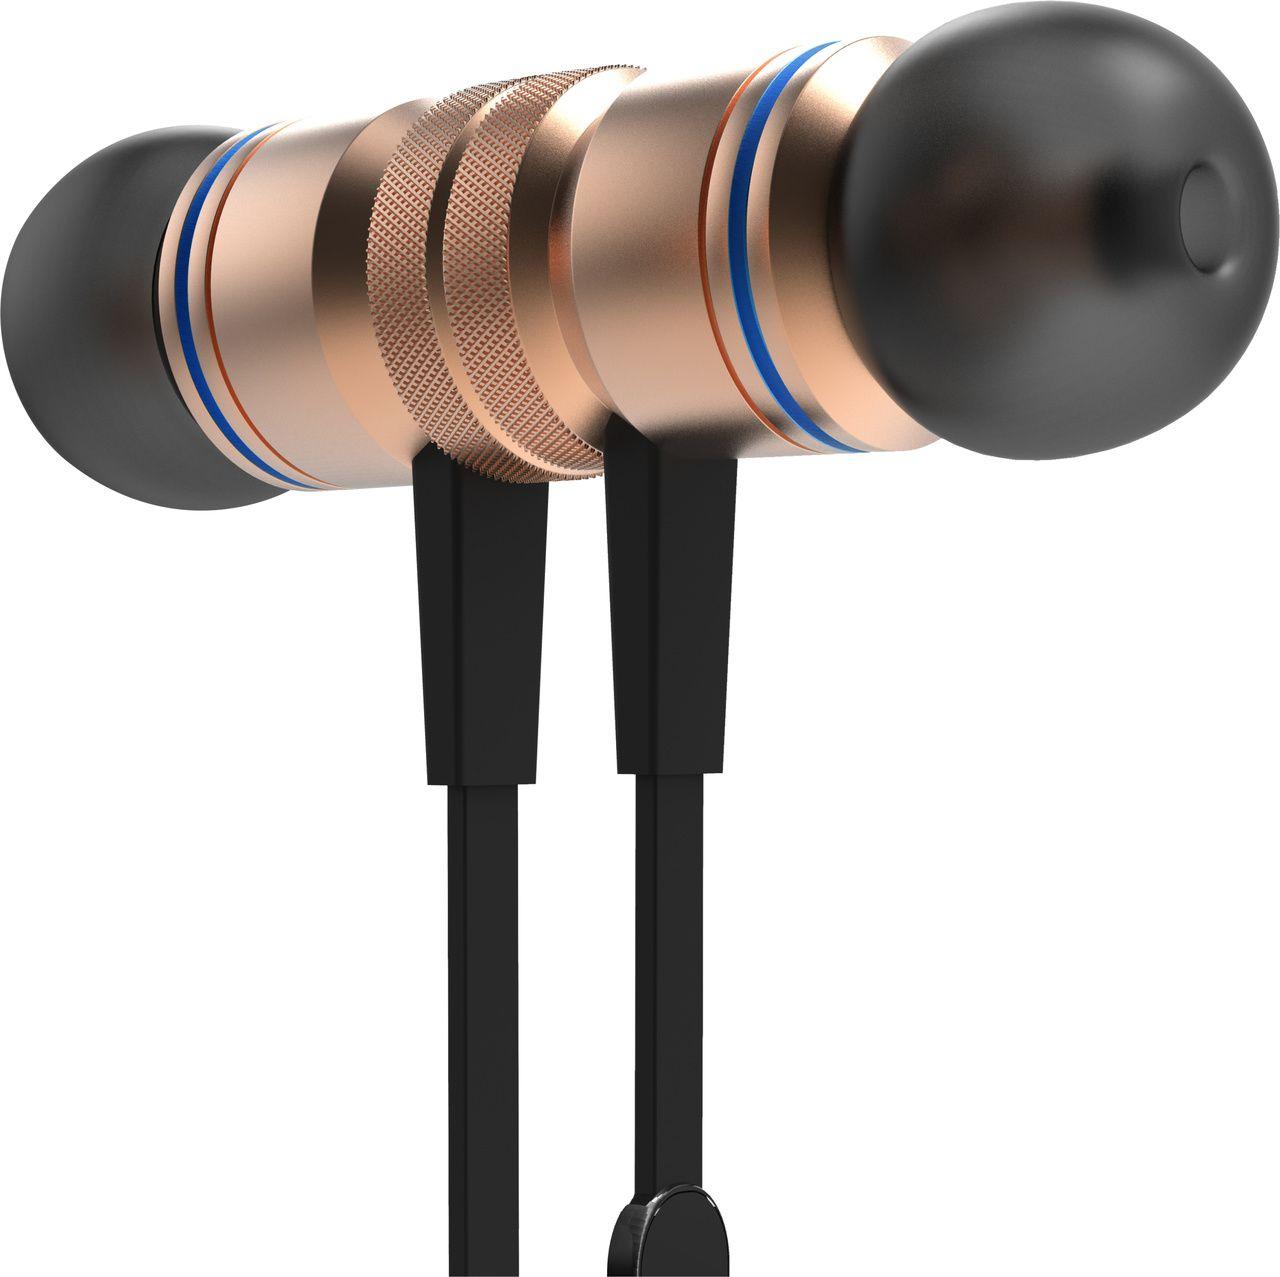 Fone de Ouvido Kimaster HI-FI c/ Microfone e  Controle de Volume  K700